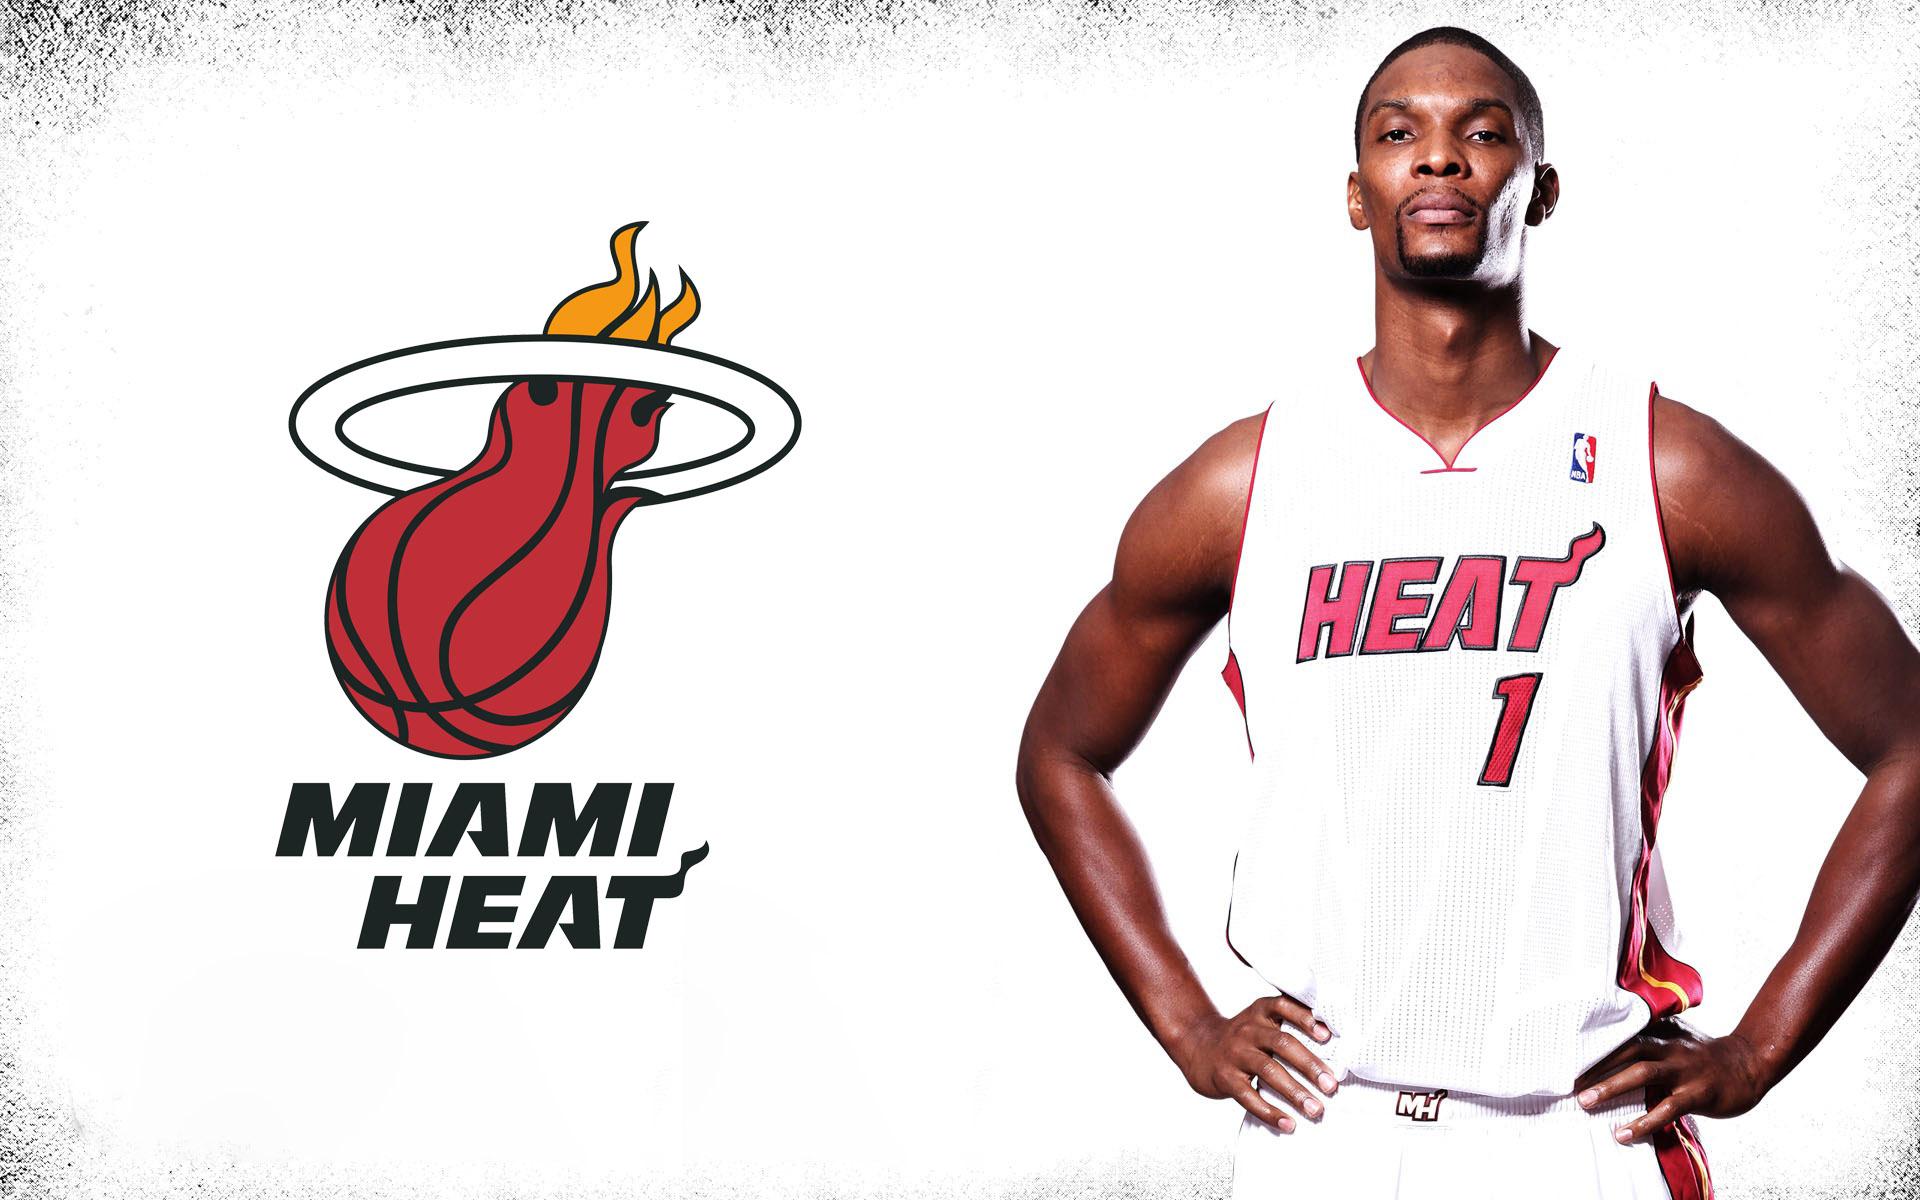 Chris Bosh 2014 Miami Heat Wallpaper Wide or HD Male Celebrities 1920x1200